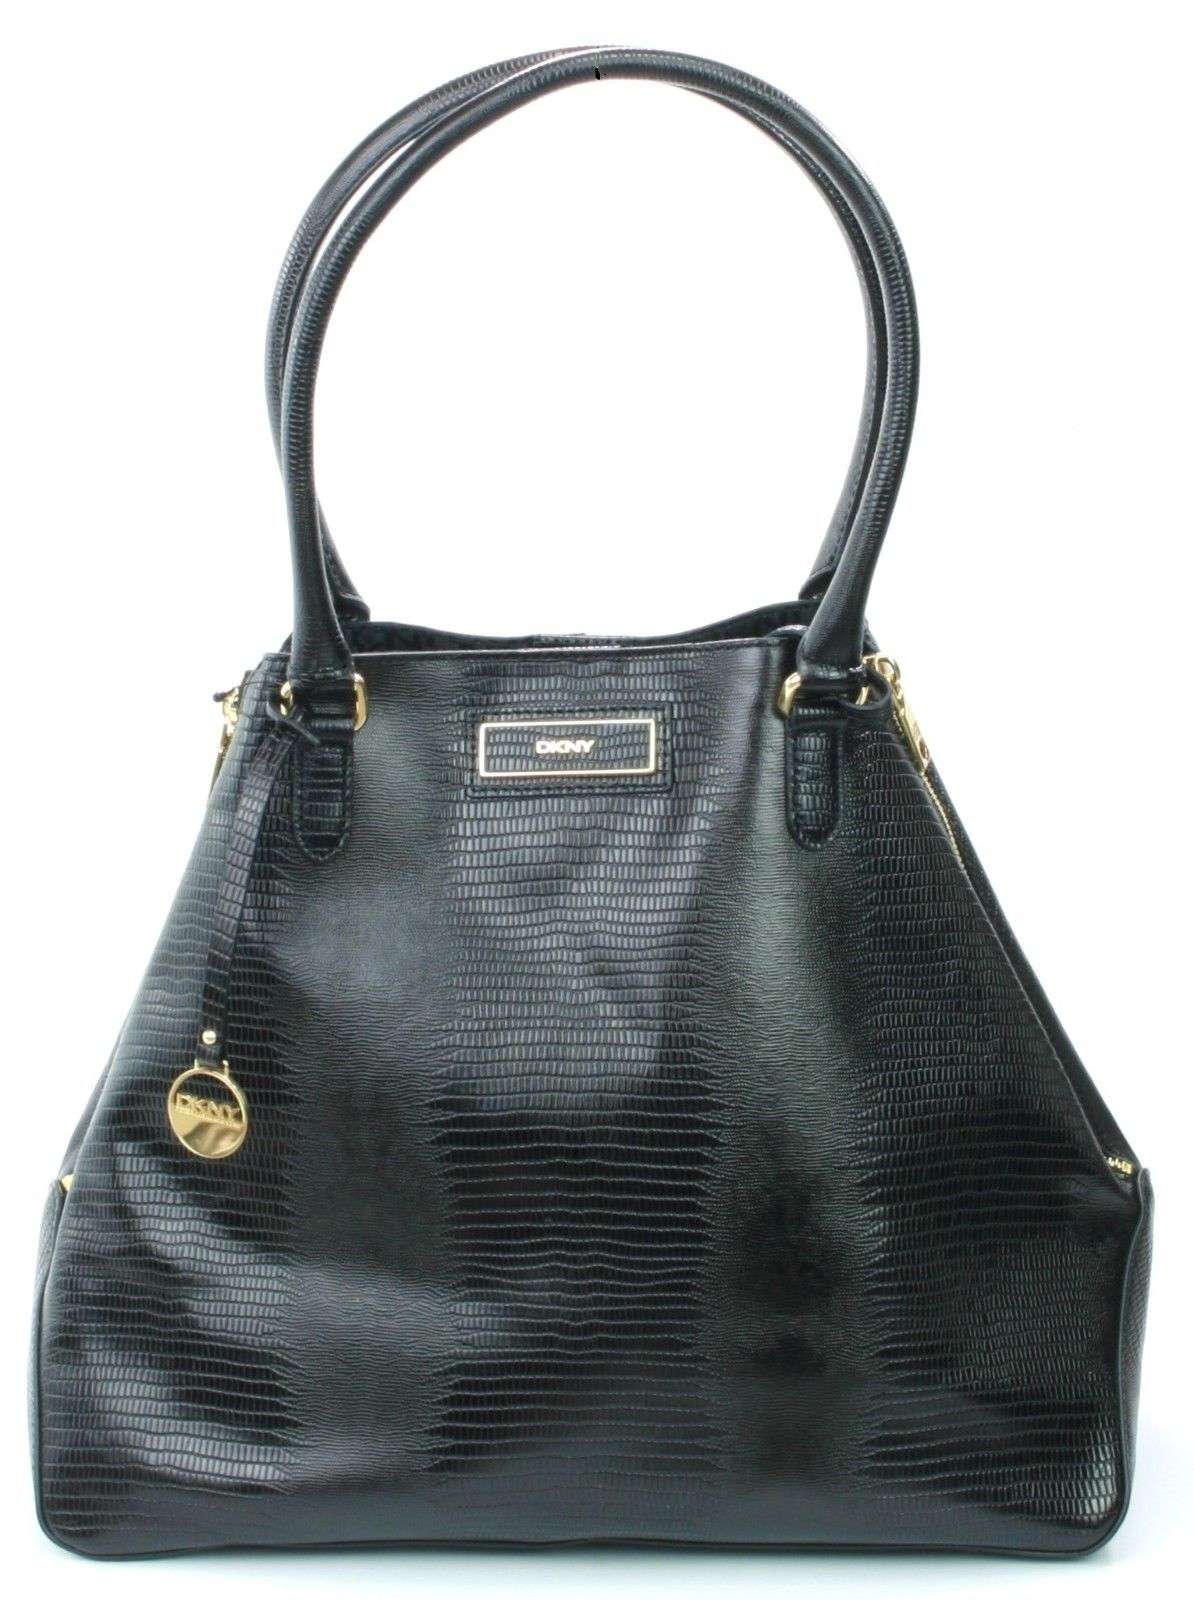 DKNY Donna Karan Black Lizard Print Leather Tote Bag Large Handbag - $300.40